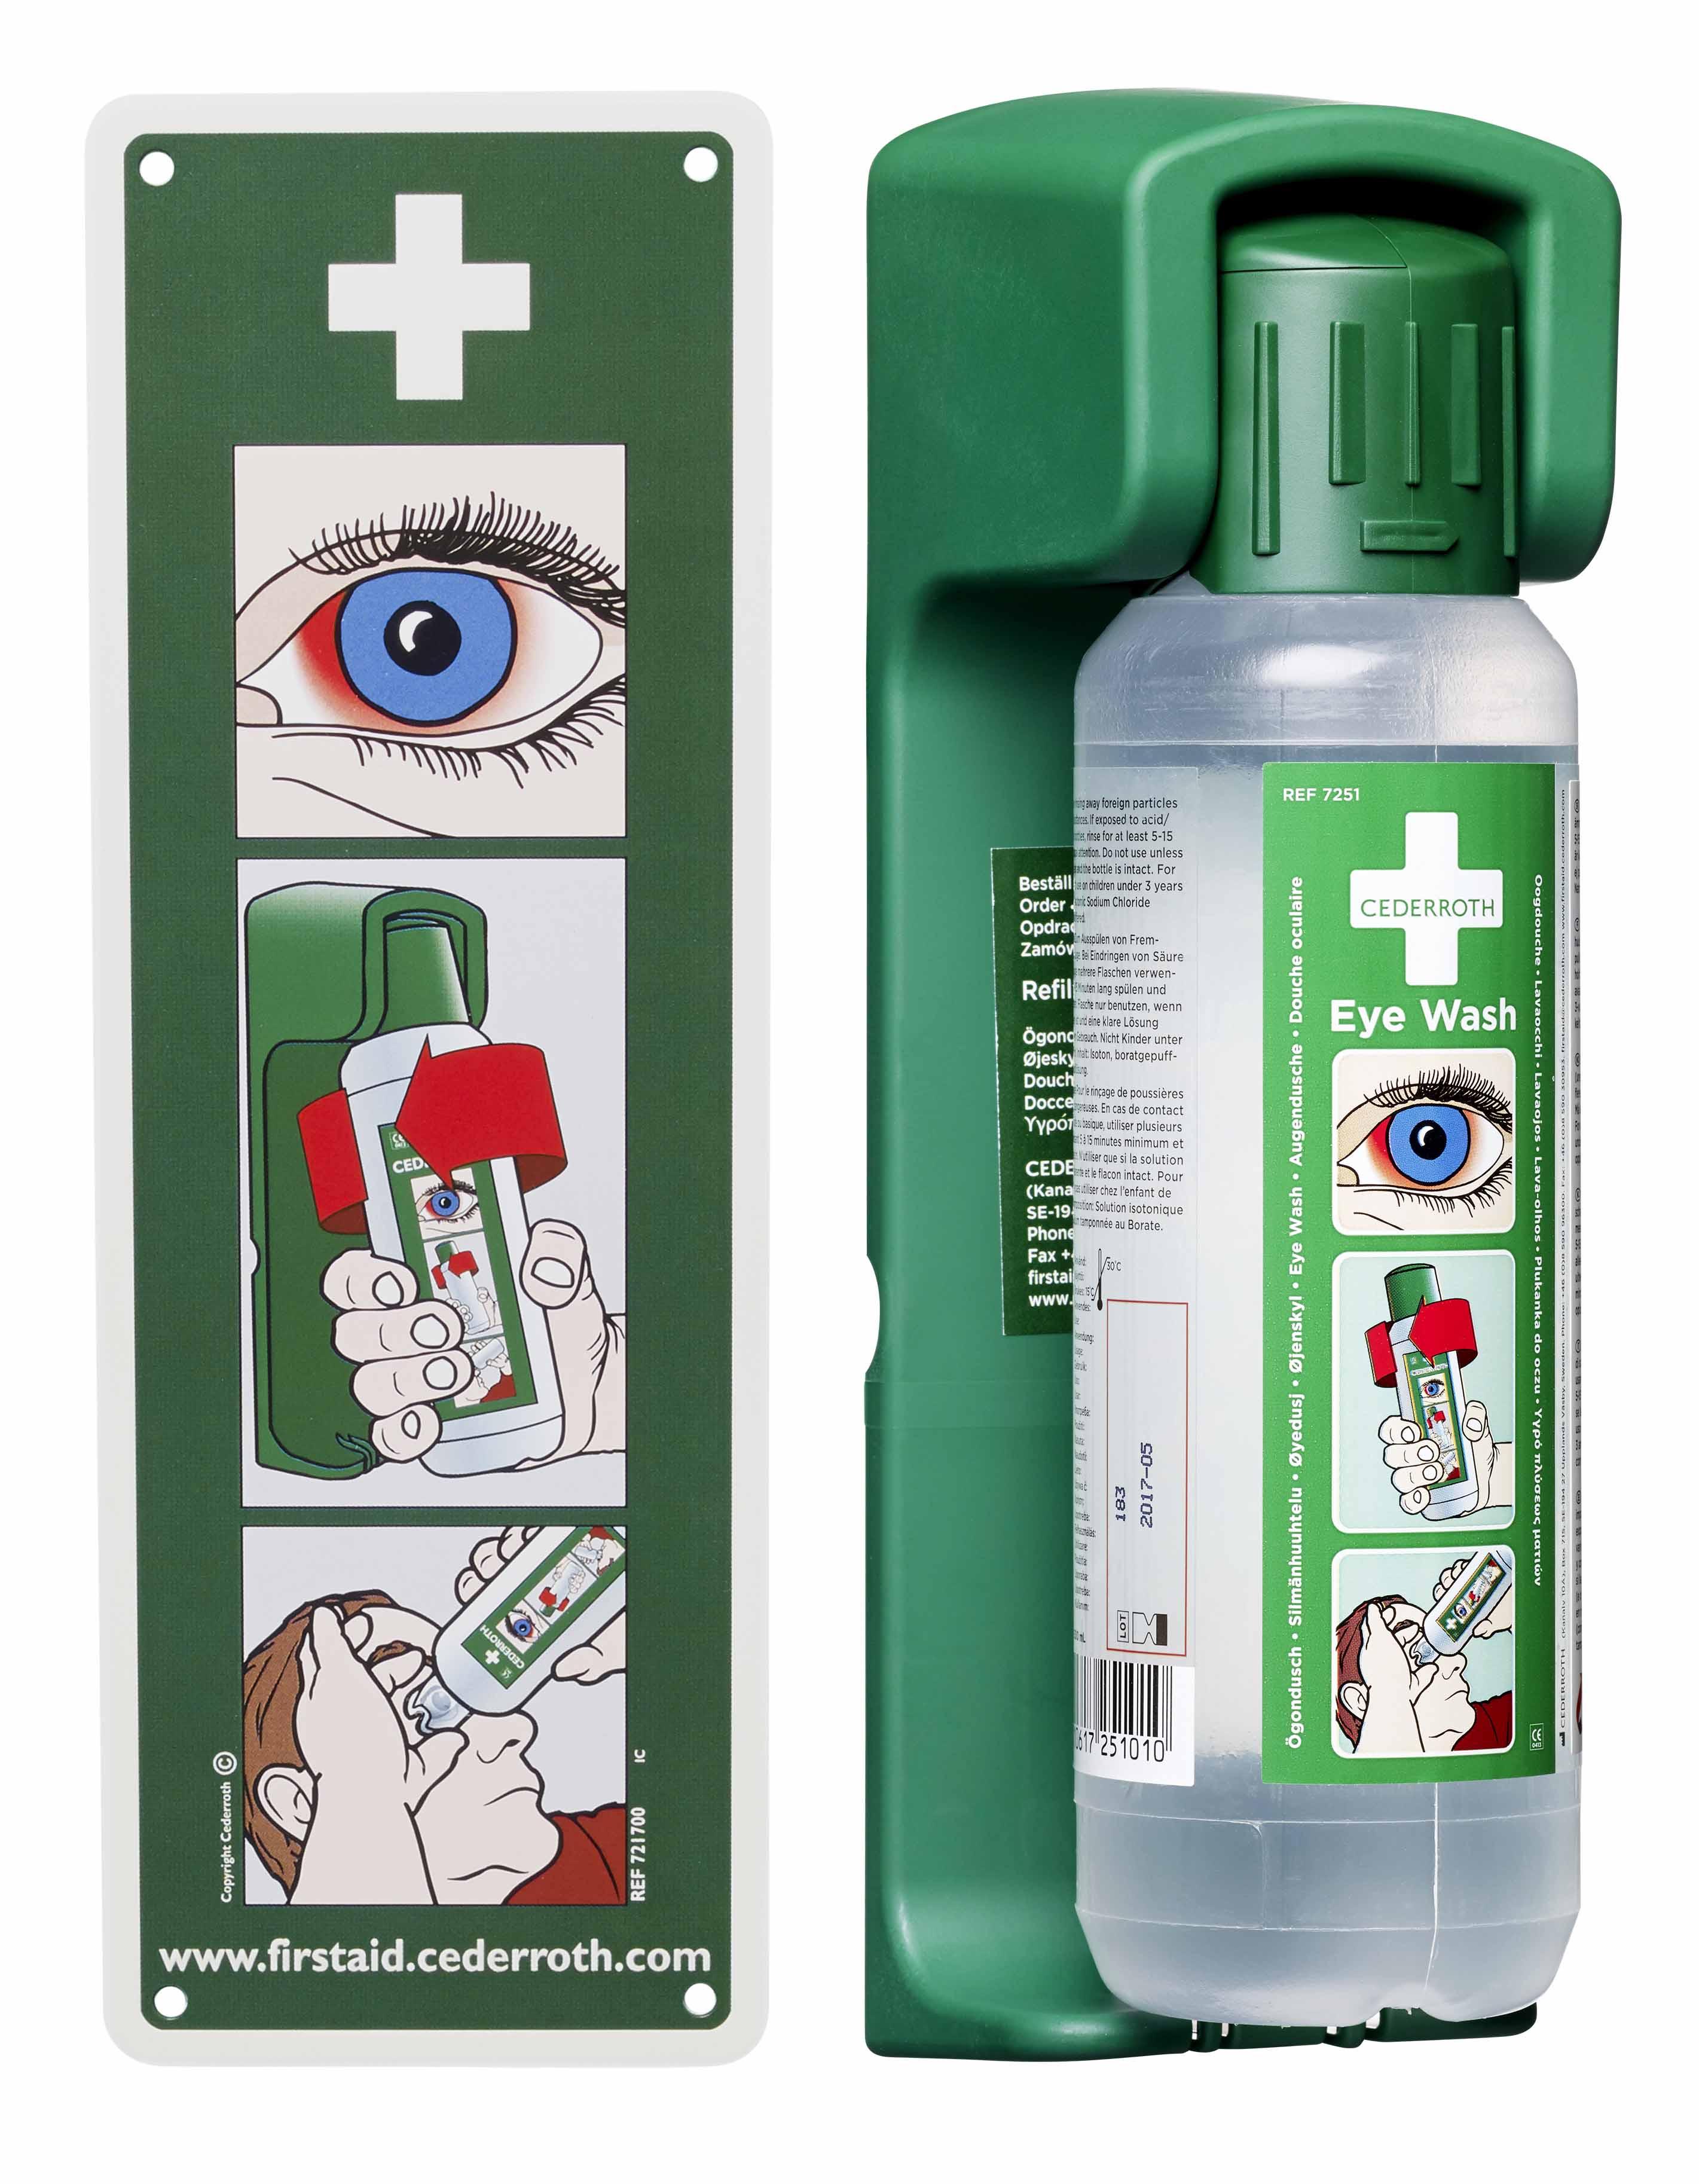 Cederroth eye wash with sign_left_7251_7200_721700_300dpi